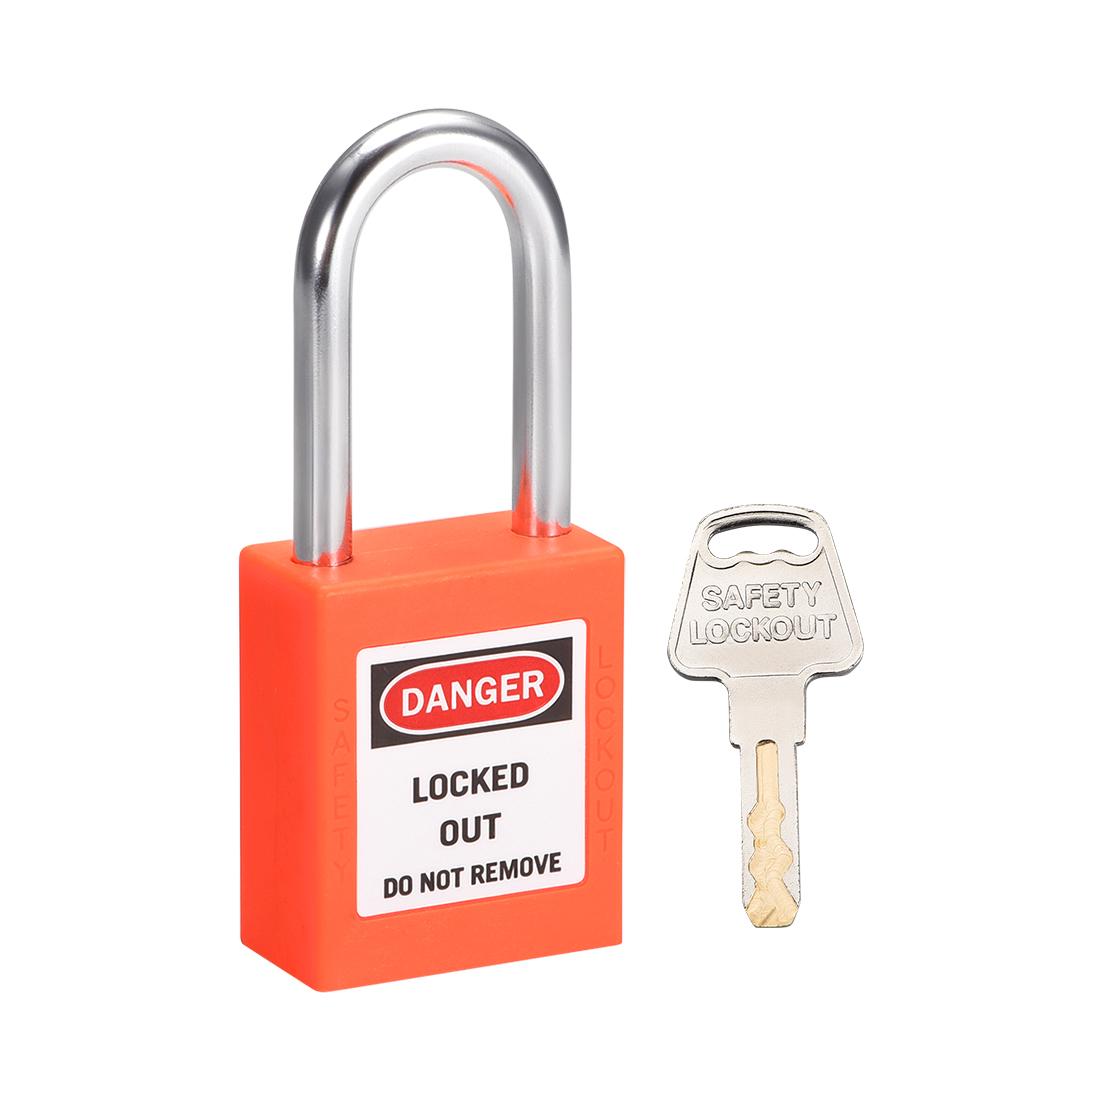 Lockout Tagout Locks 1-1/2 Inch Shackle Key Alike Safety Padlock Plastic Orange